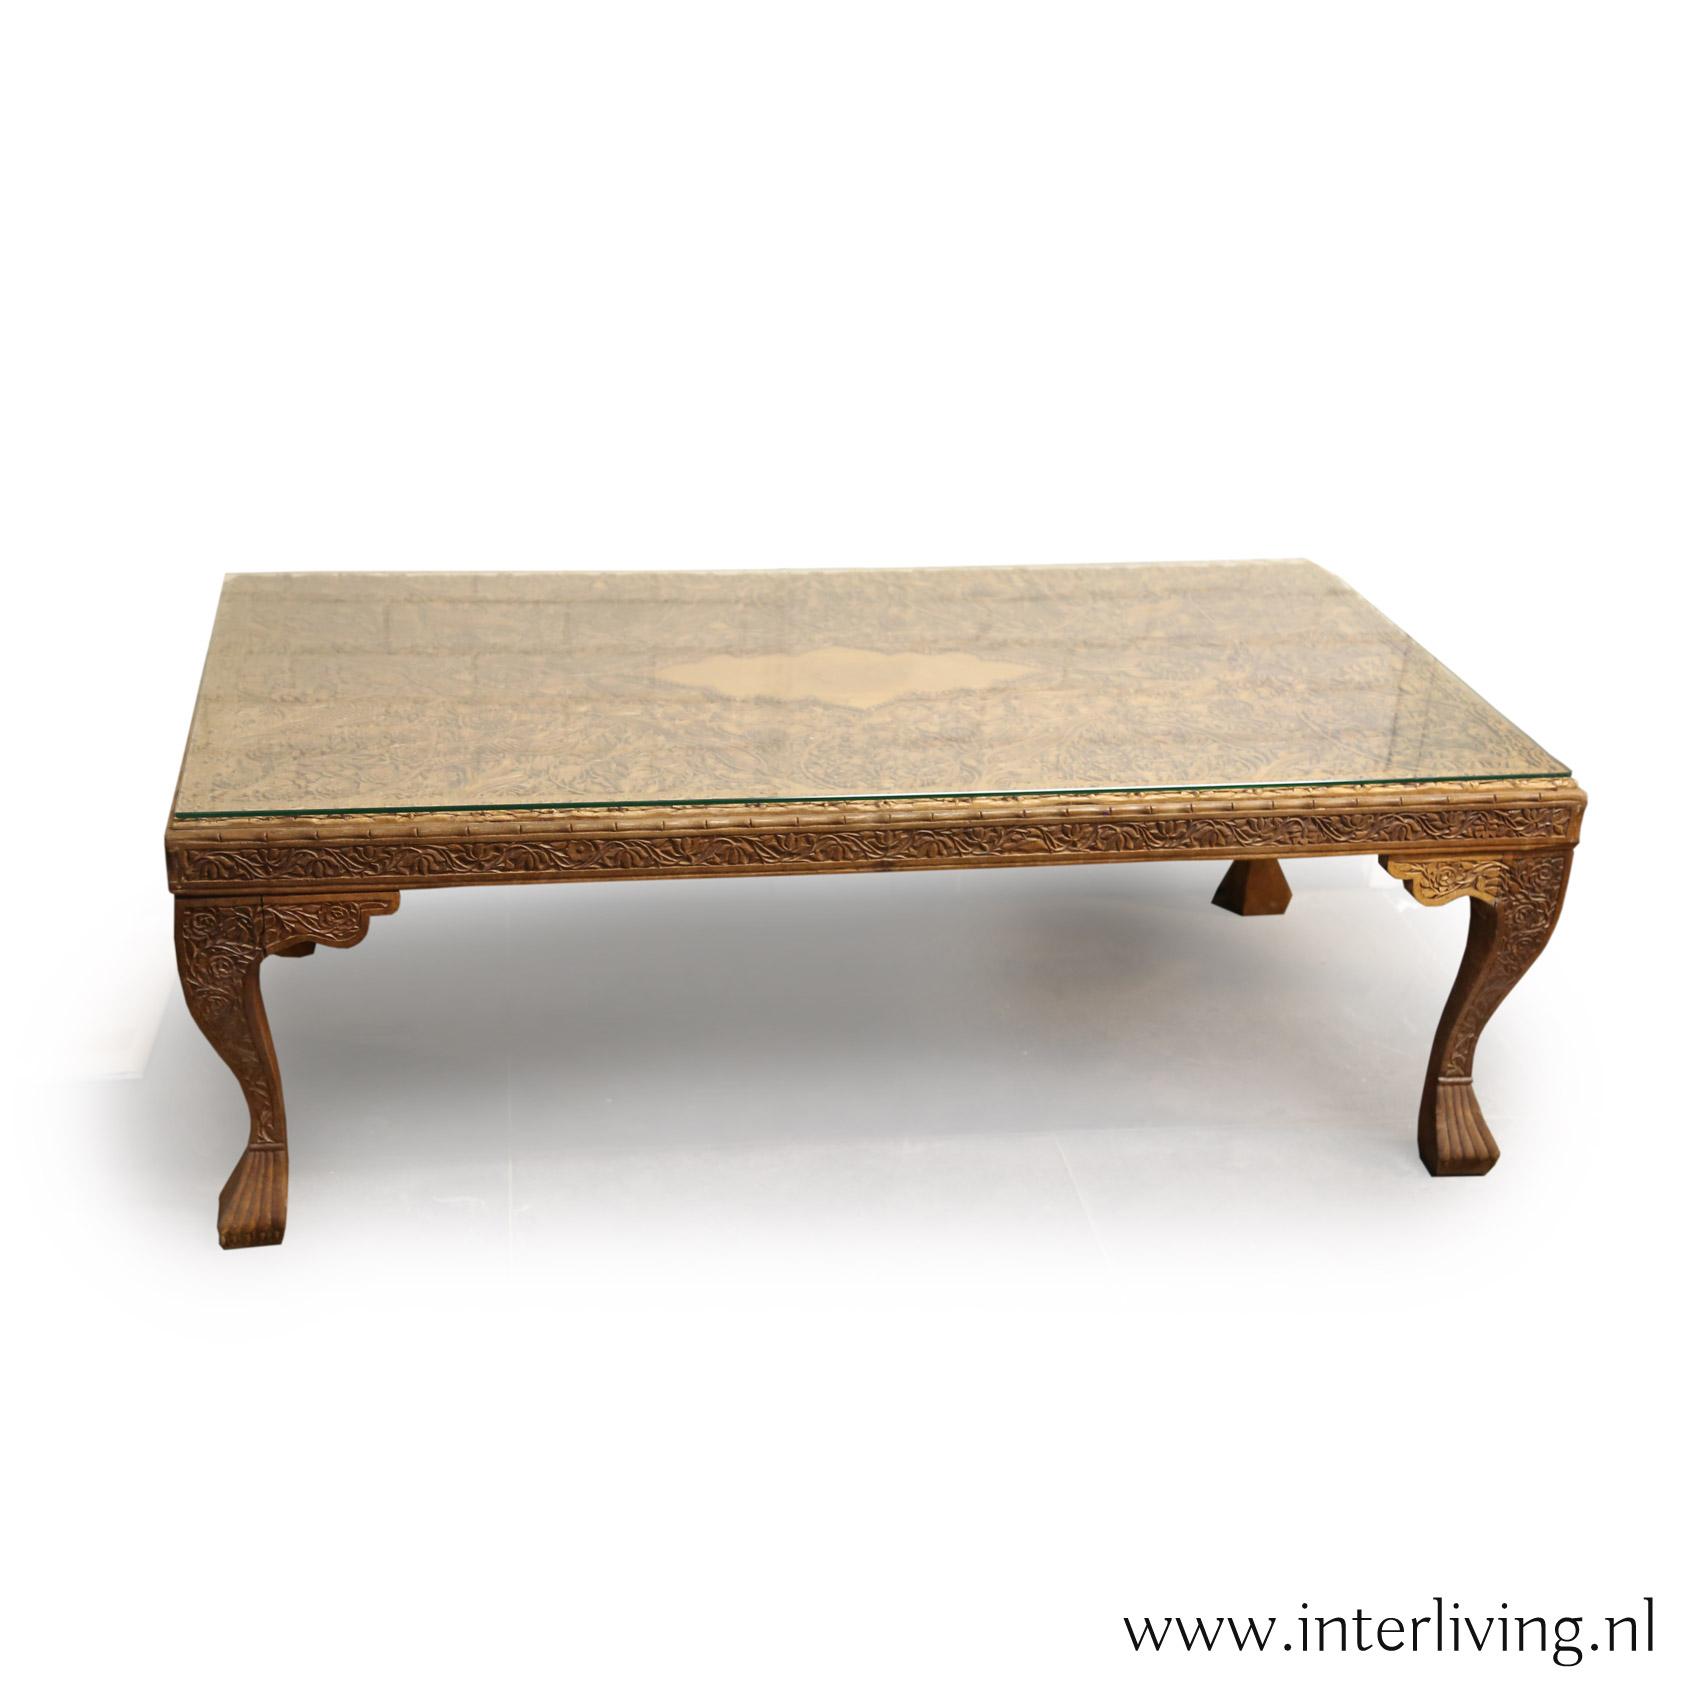 oosterse salontafel met houtsnijwerk - vintage retro stijl - naturel hout - styling landelijk of bohemian huis